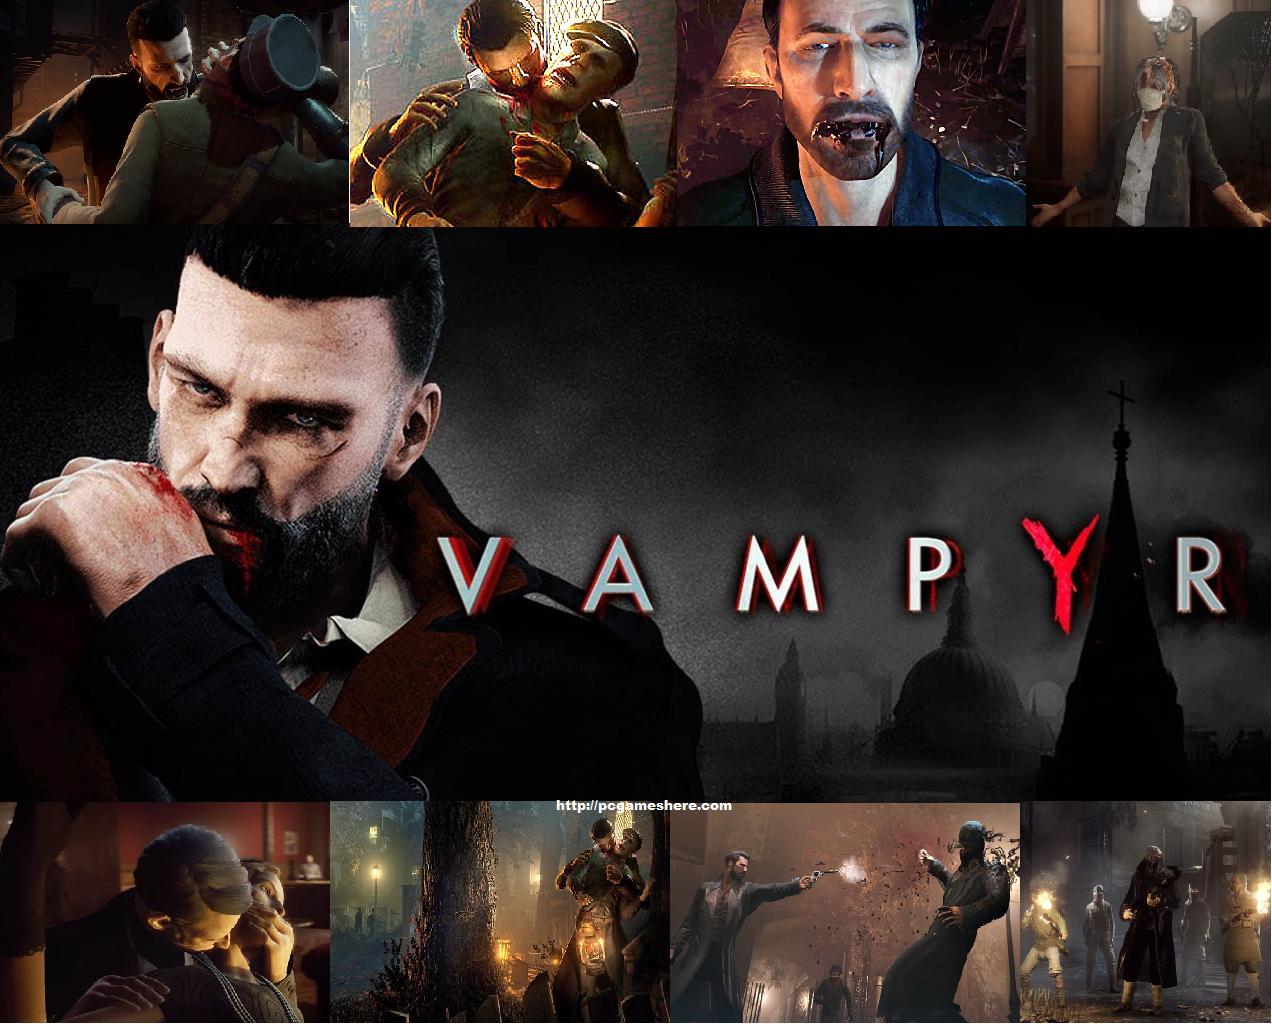 Vampyr Pc Download Free Full Version Game Highly